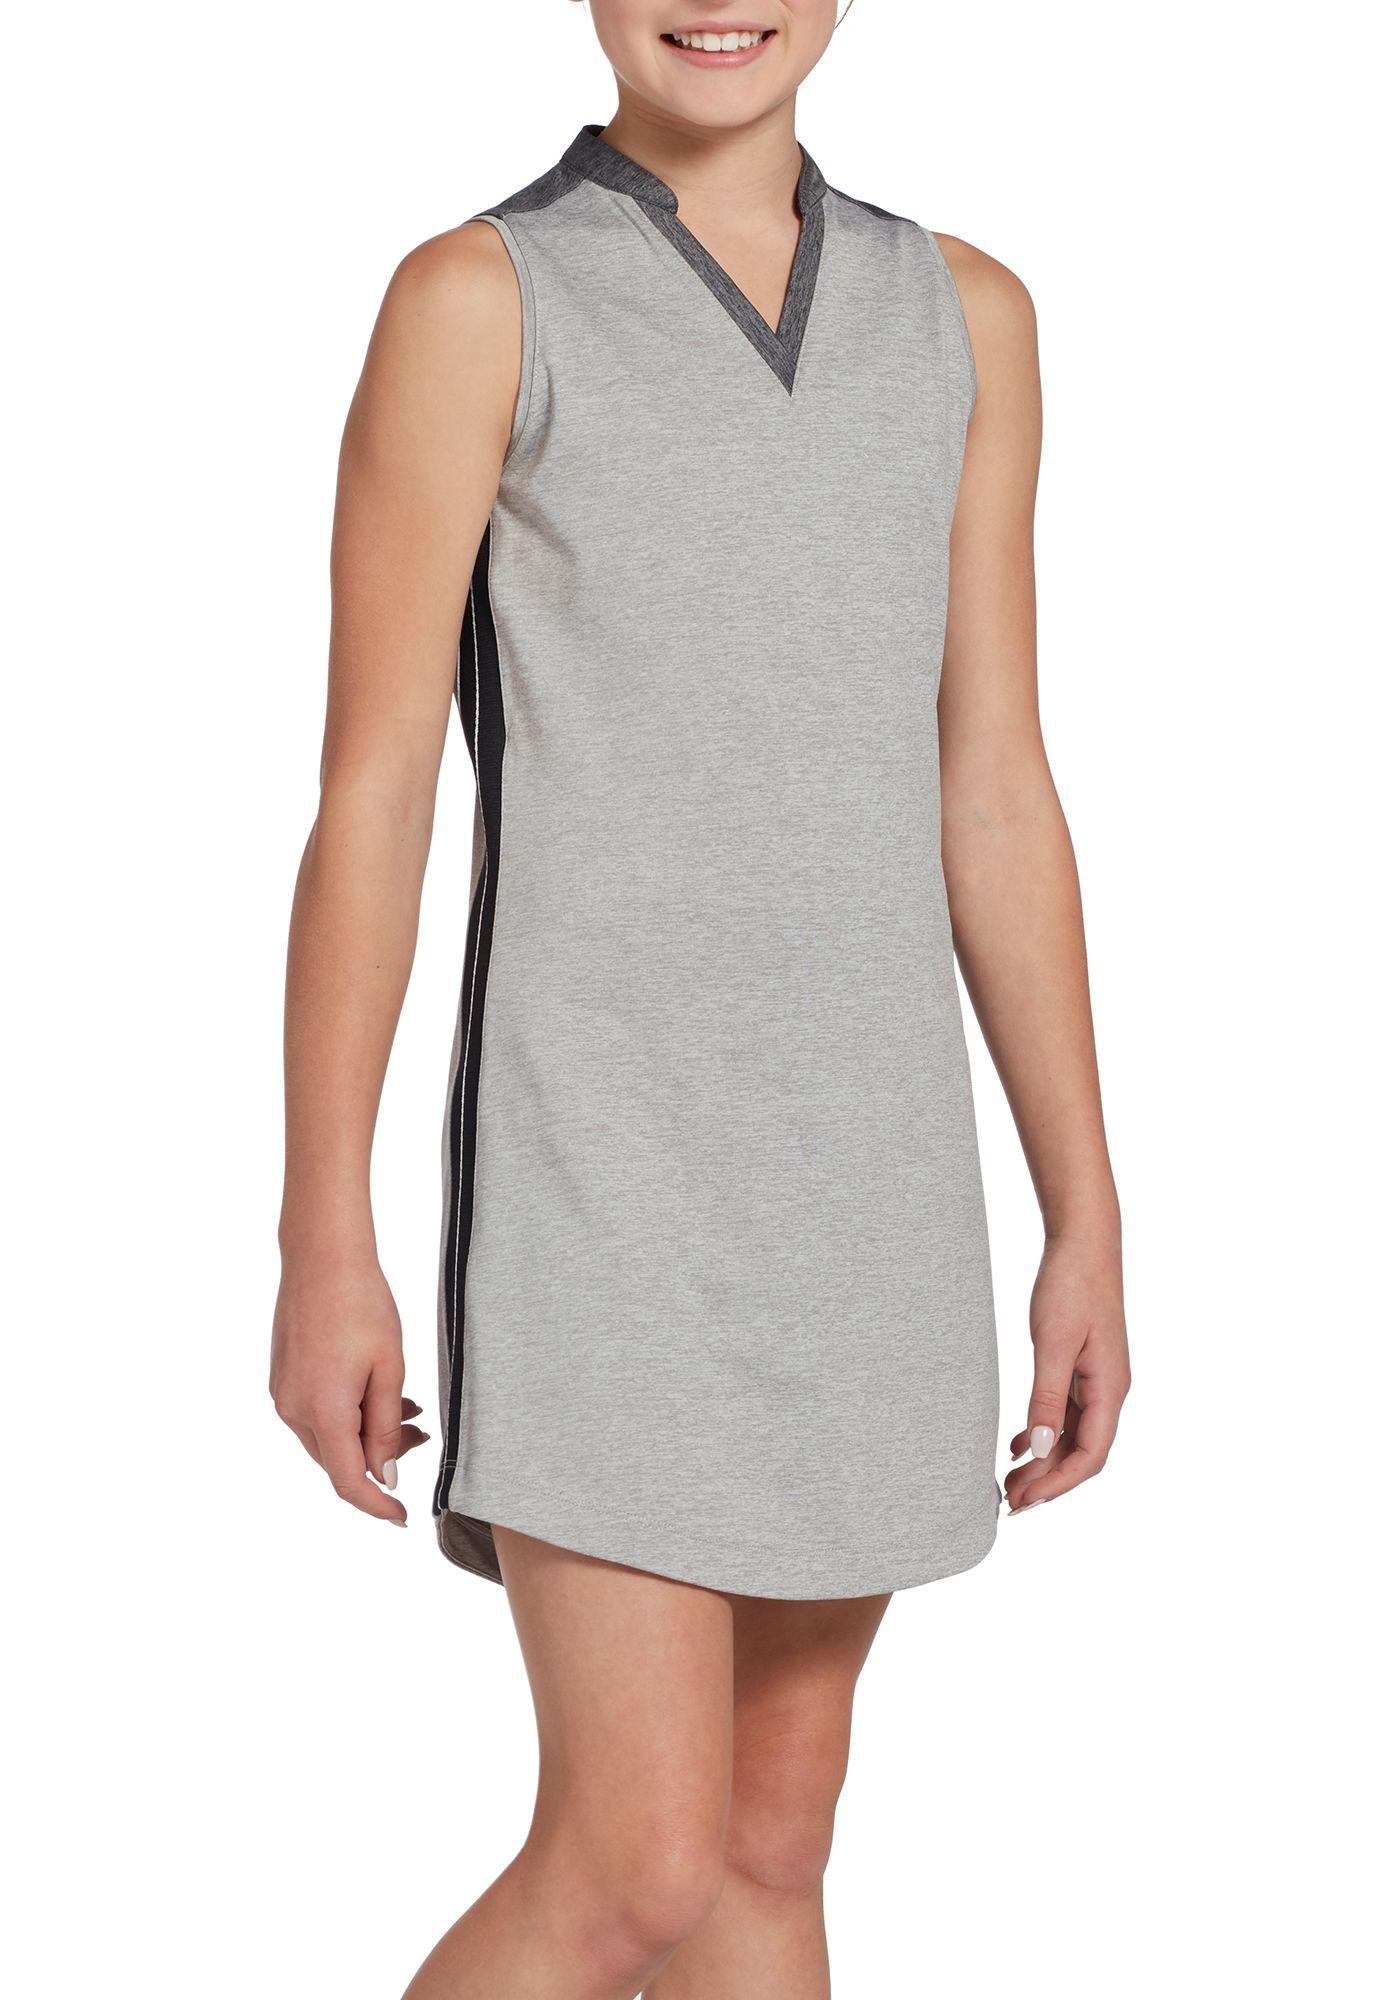 Slazenger Girls' Rib Trim Golf Dress